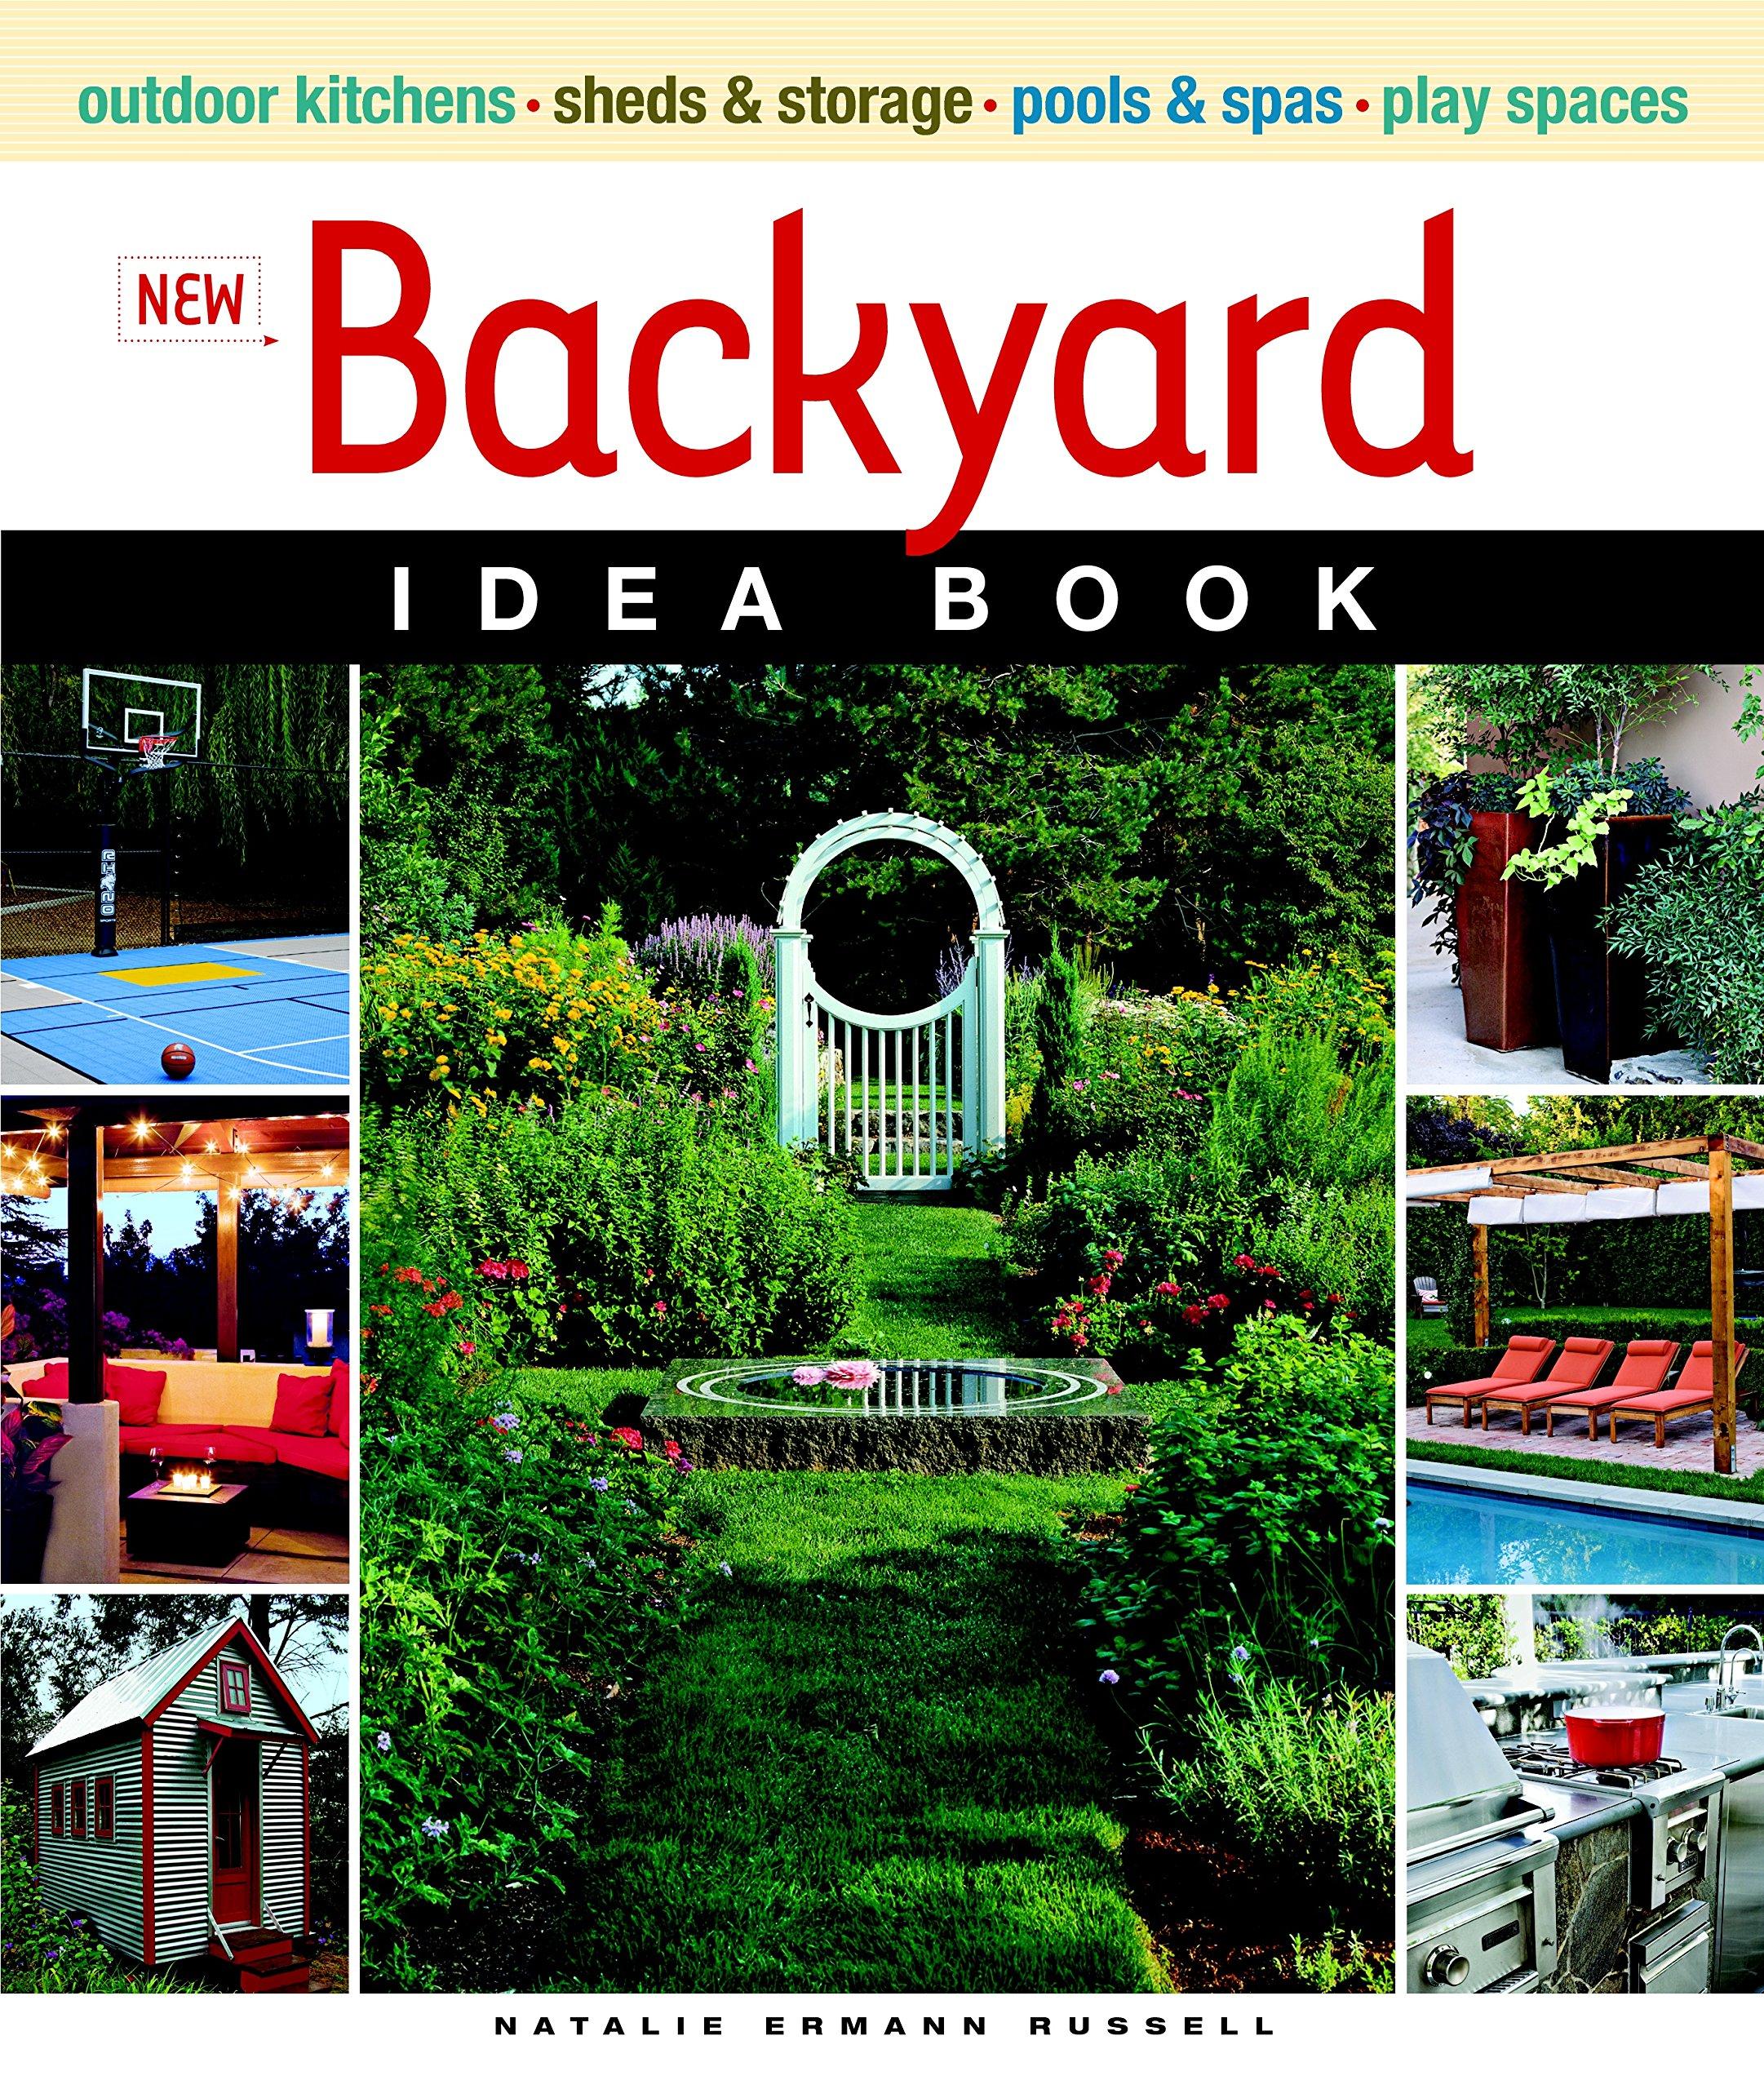 new backyard idea book taunton home idea books natalie ermann